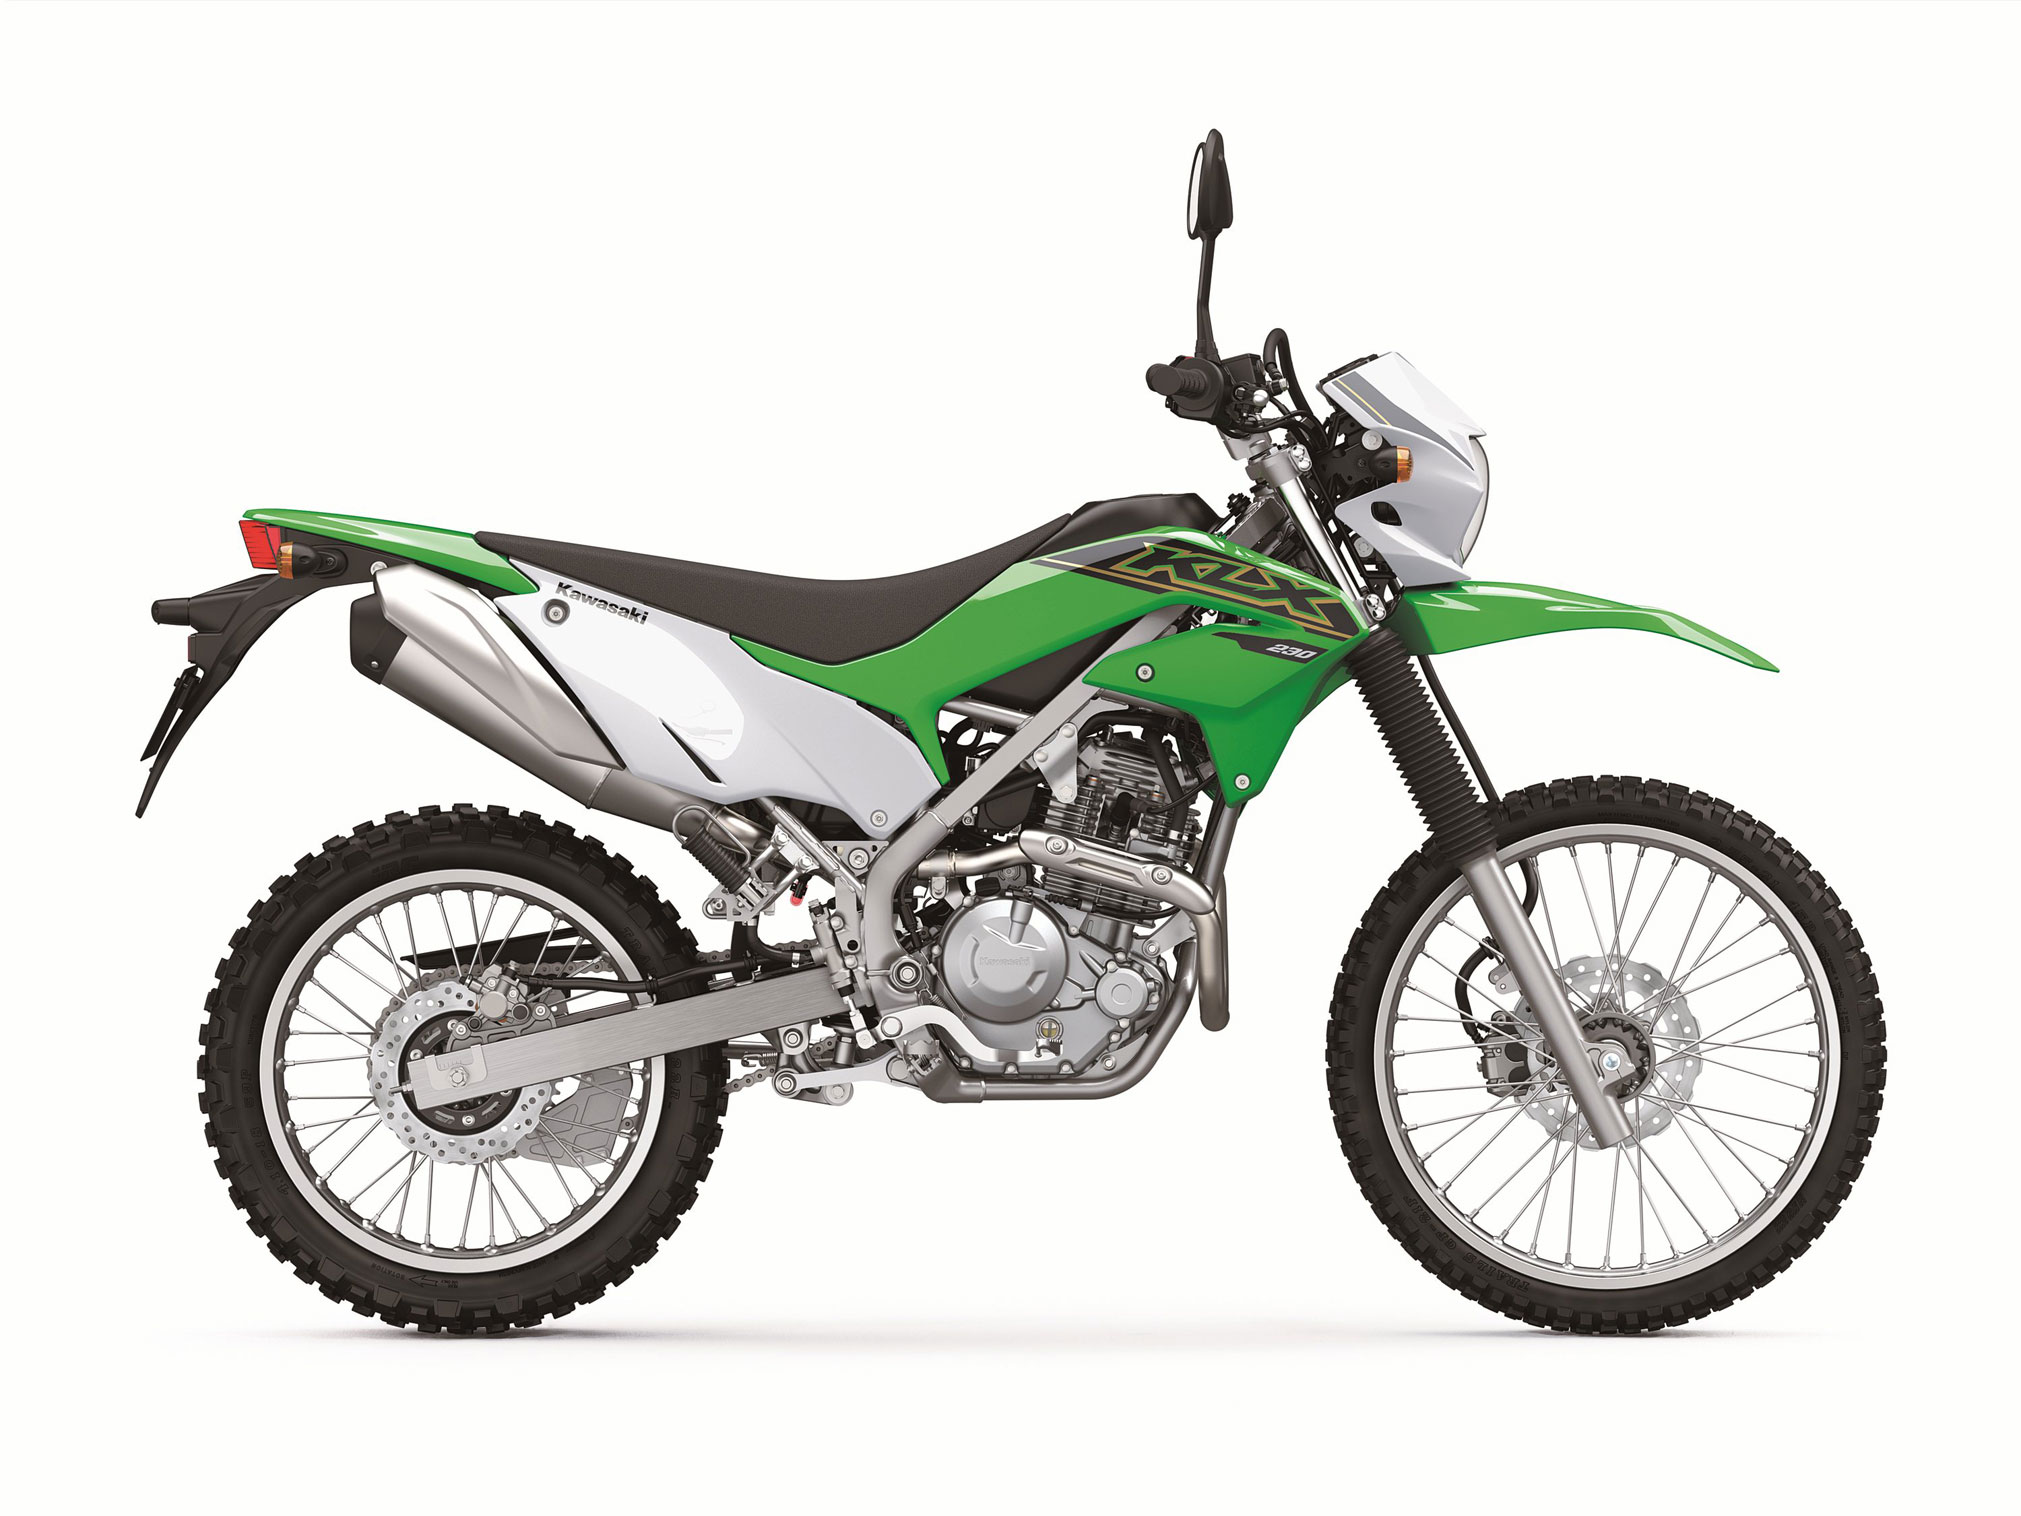 2021 Kawasaki KLX230 Guide • Total Motorcycle